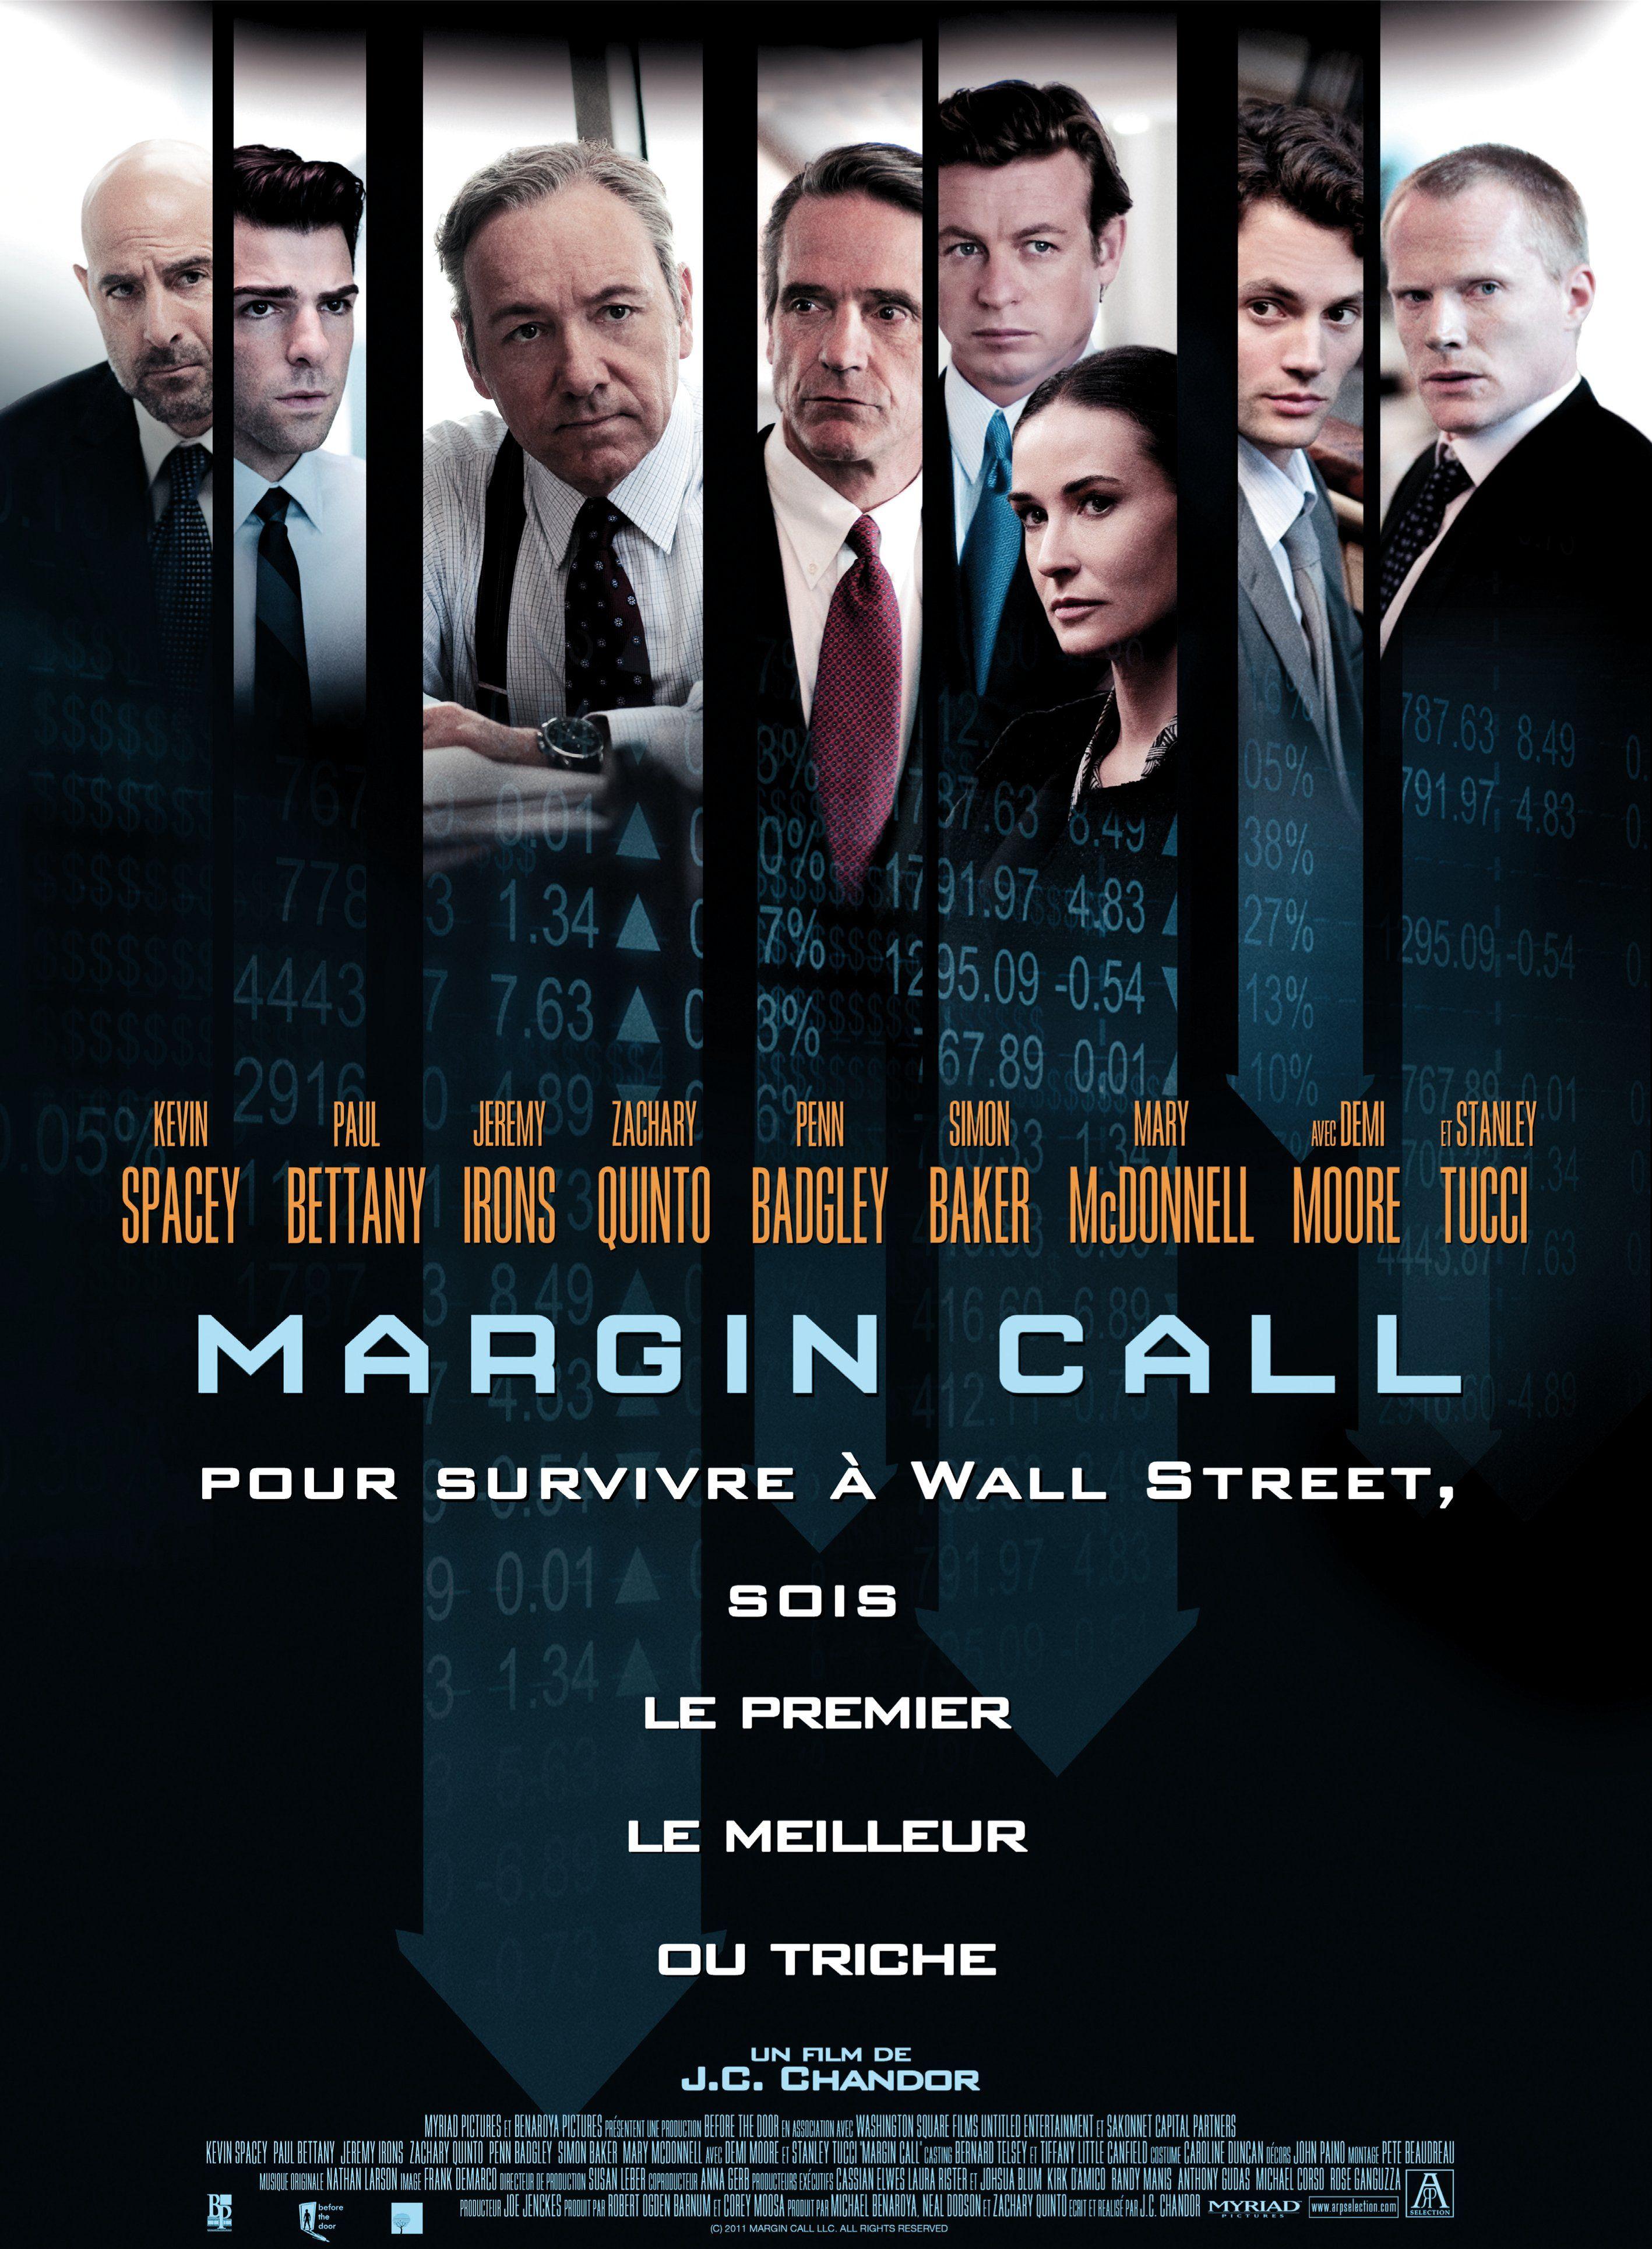 Margin Call De J C Chandor Bon Film Kevin Spacey Paul Bettany